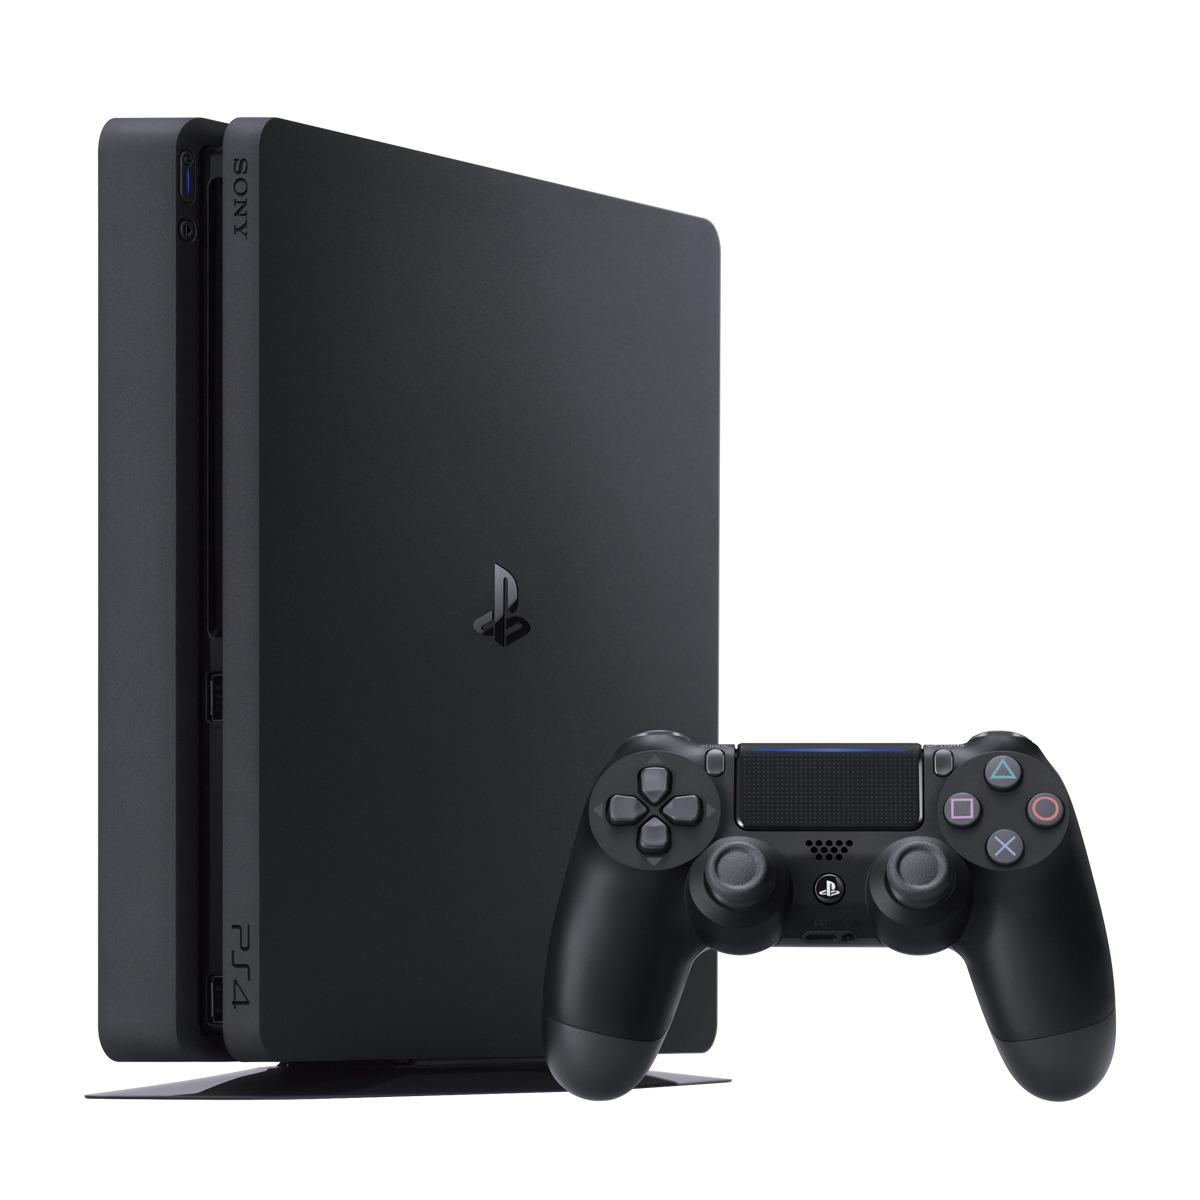 PS4 Slim- Playstation Station 4 Slim de 500GB